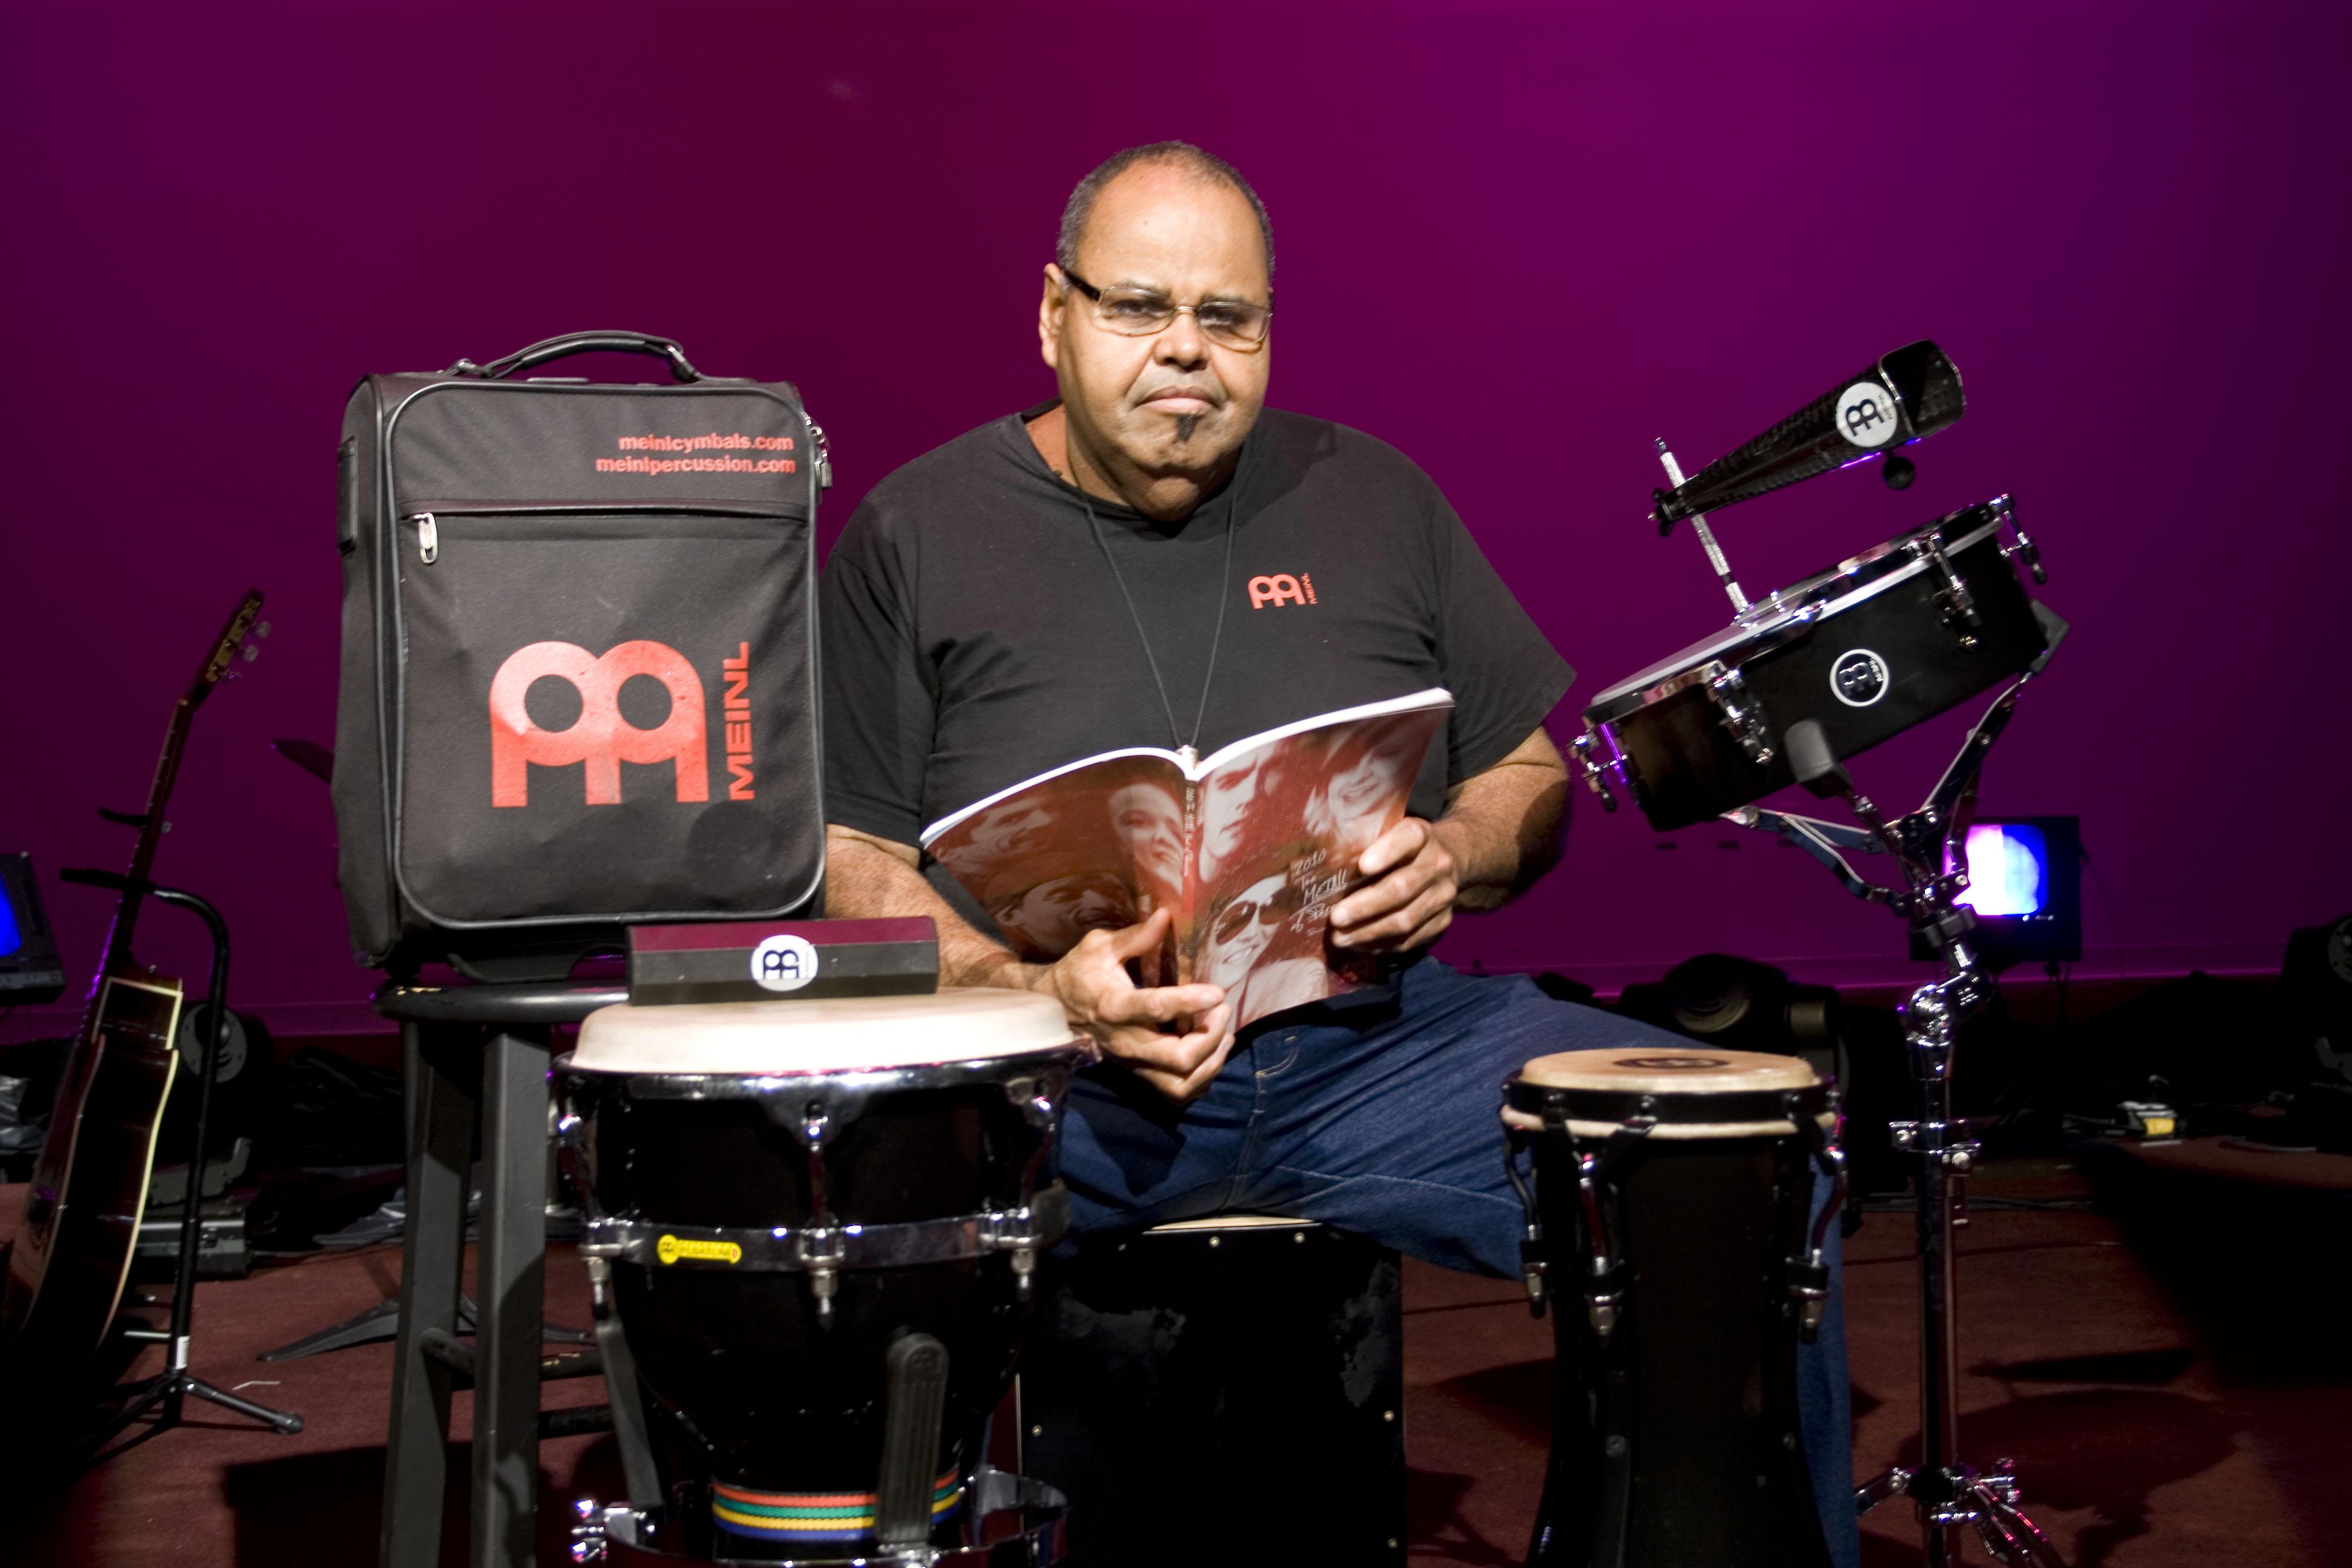 Percussionist Derrick Edwards